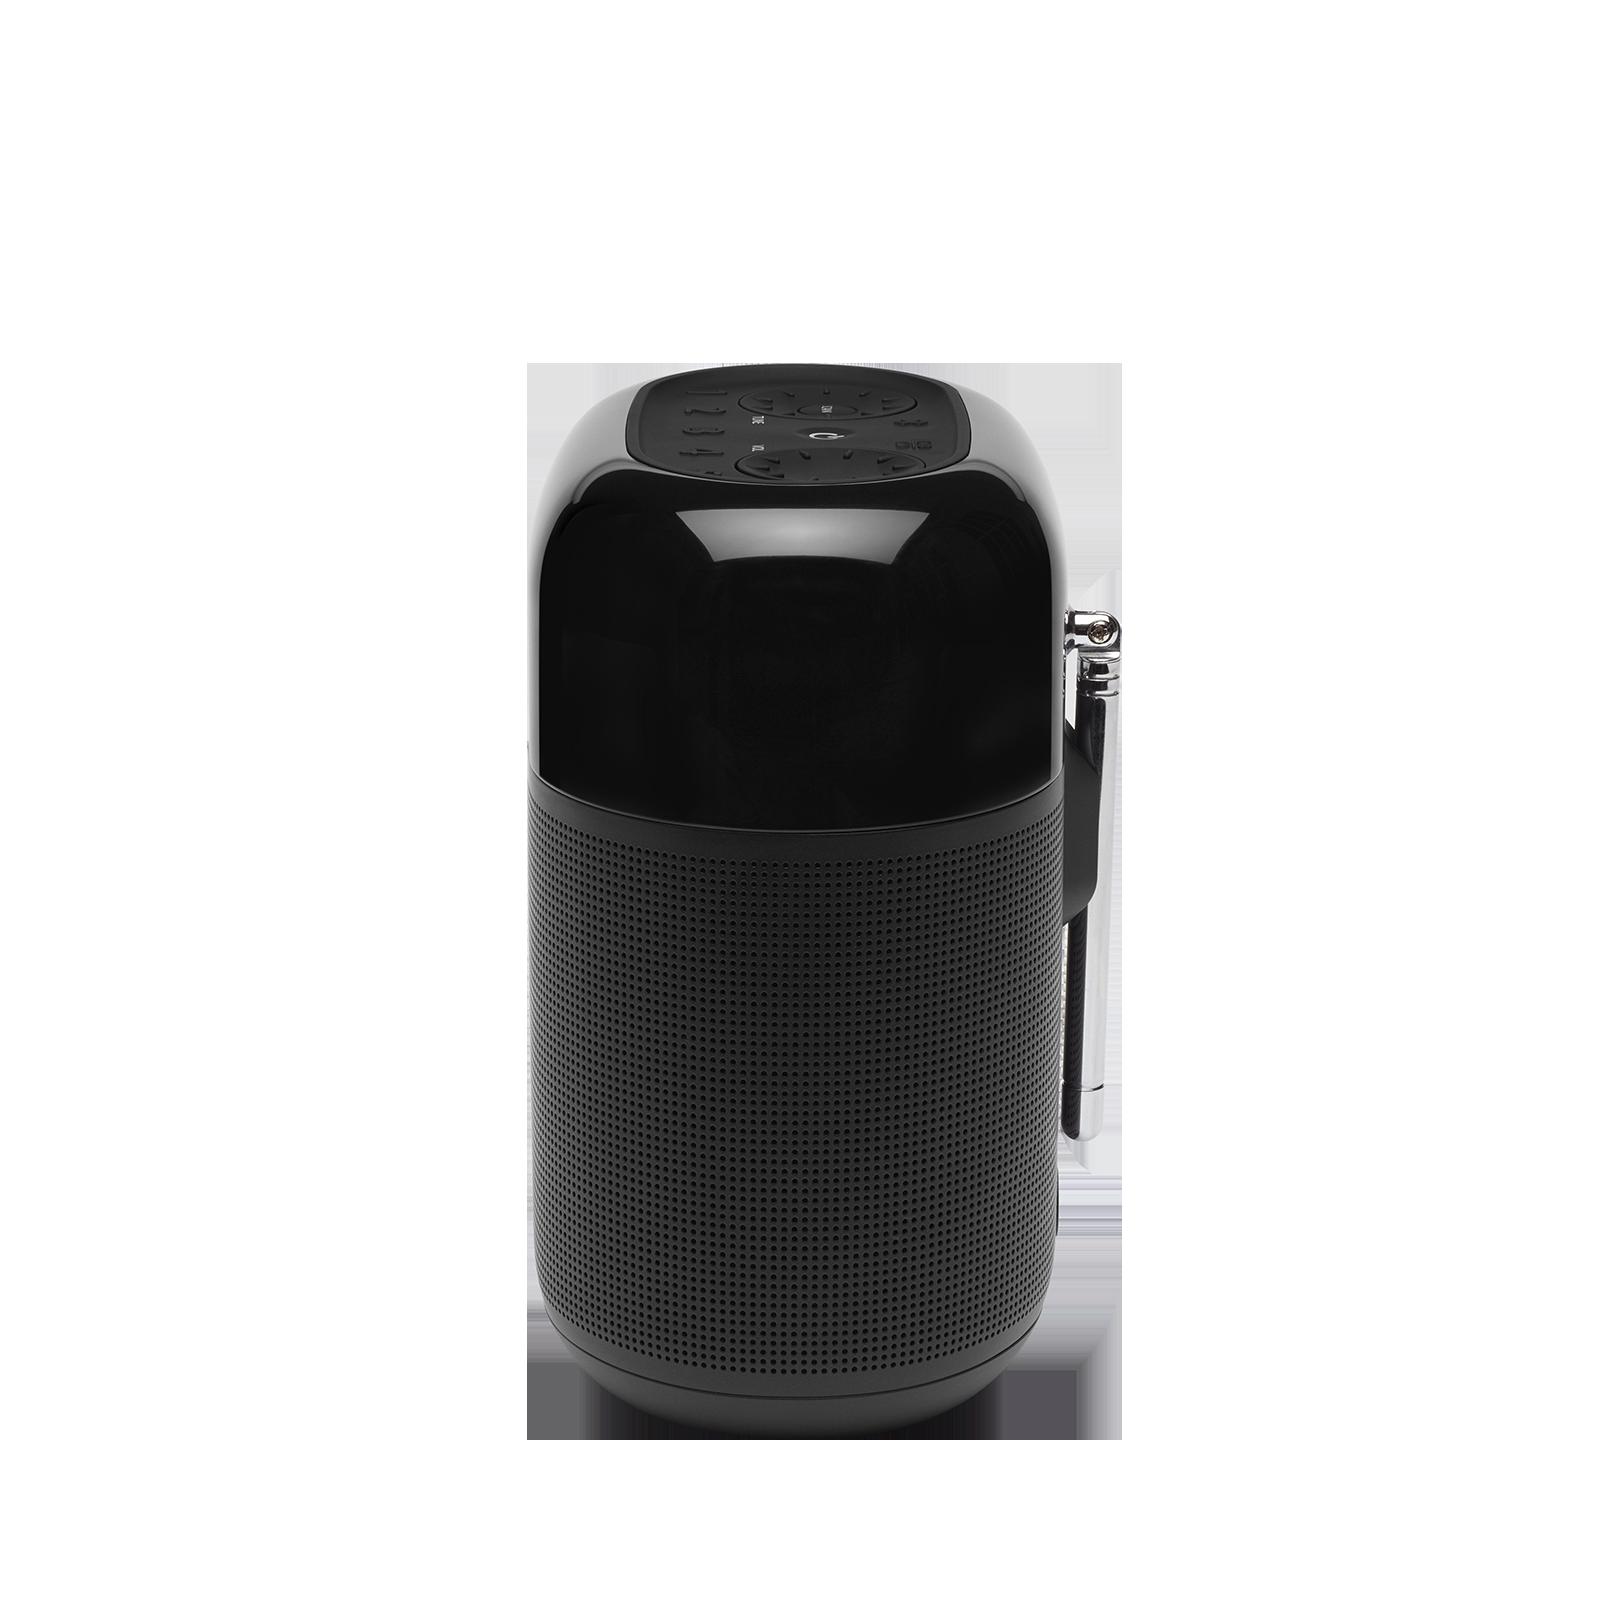 JBL Tuner XL - Black - Portable powerful DAB/DAB+/FM radio with Bluetooth - Left